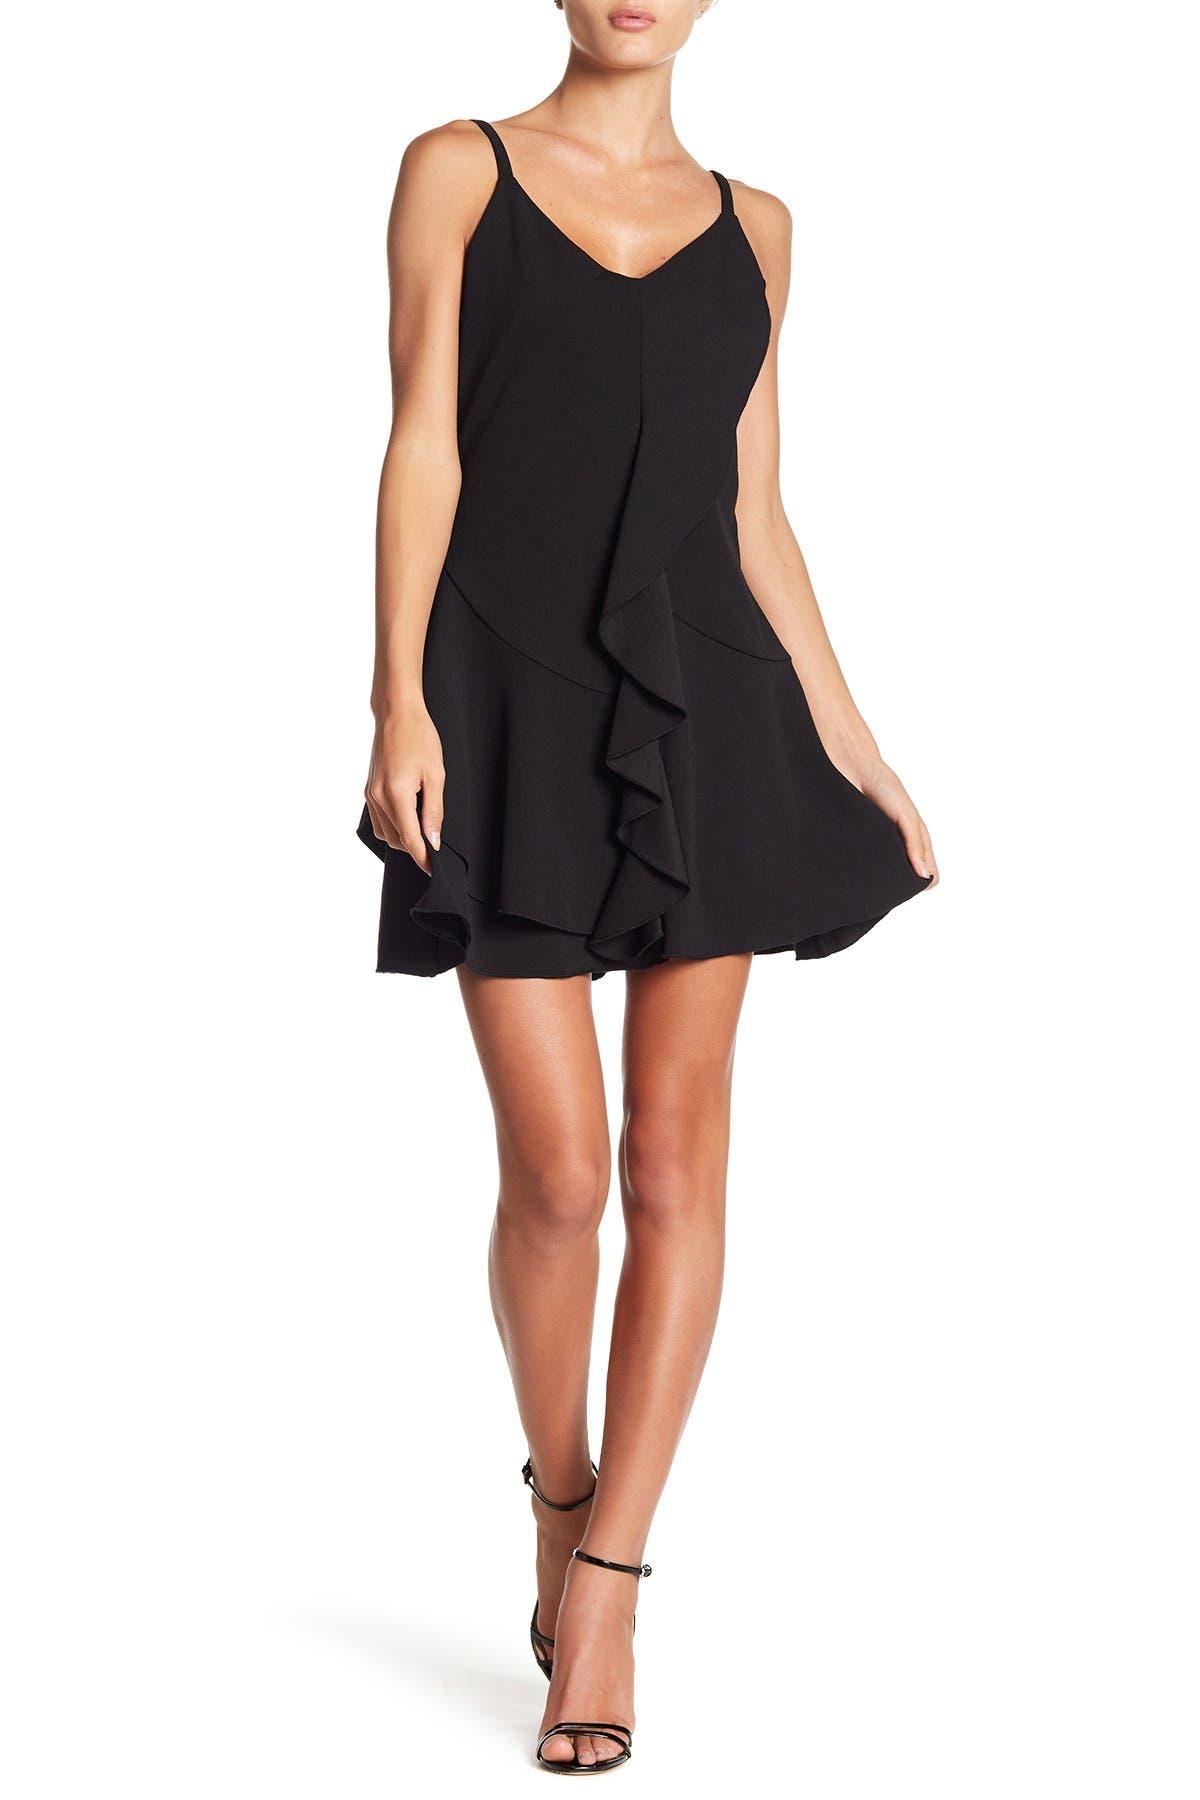 Image of bebe Ruffled V-Neck Dress